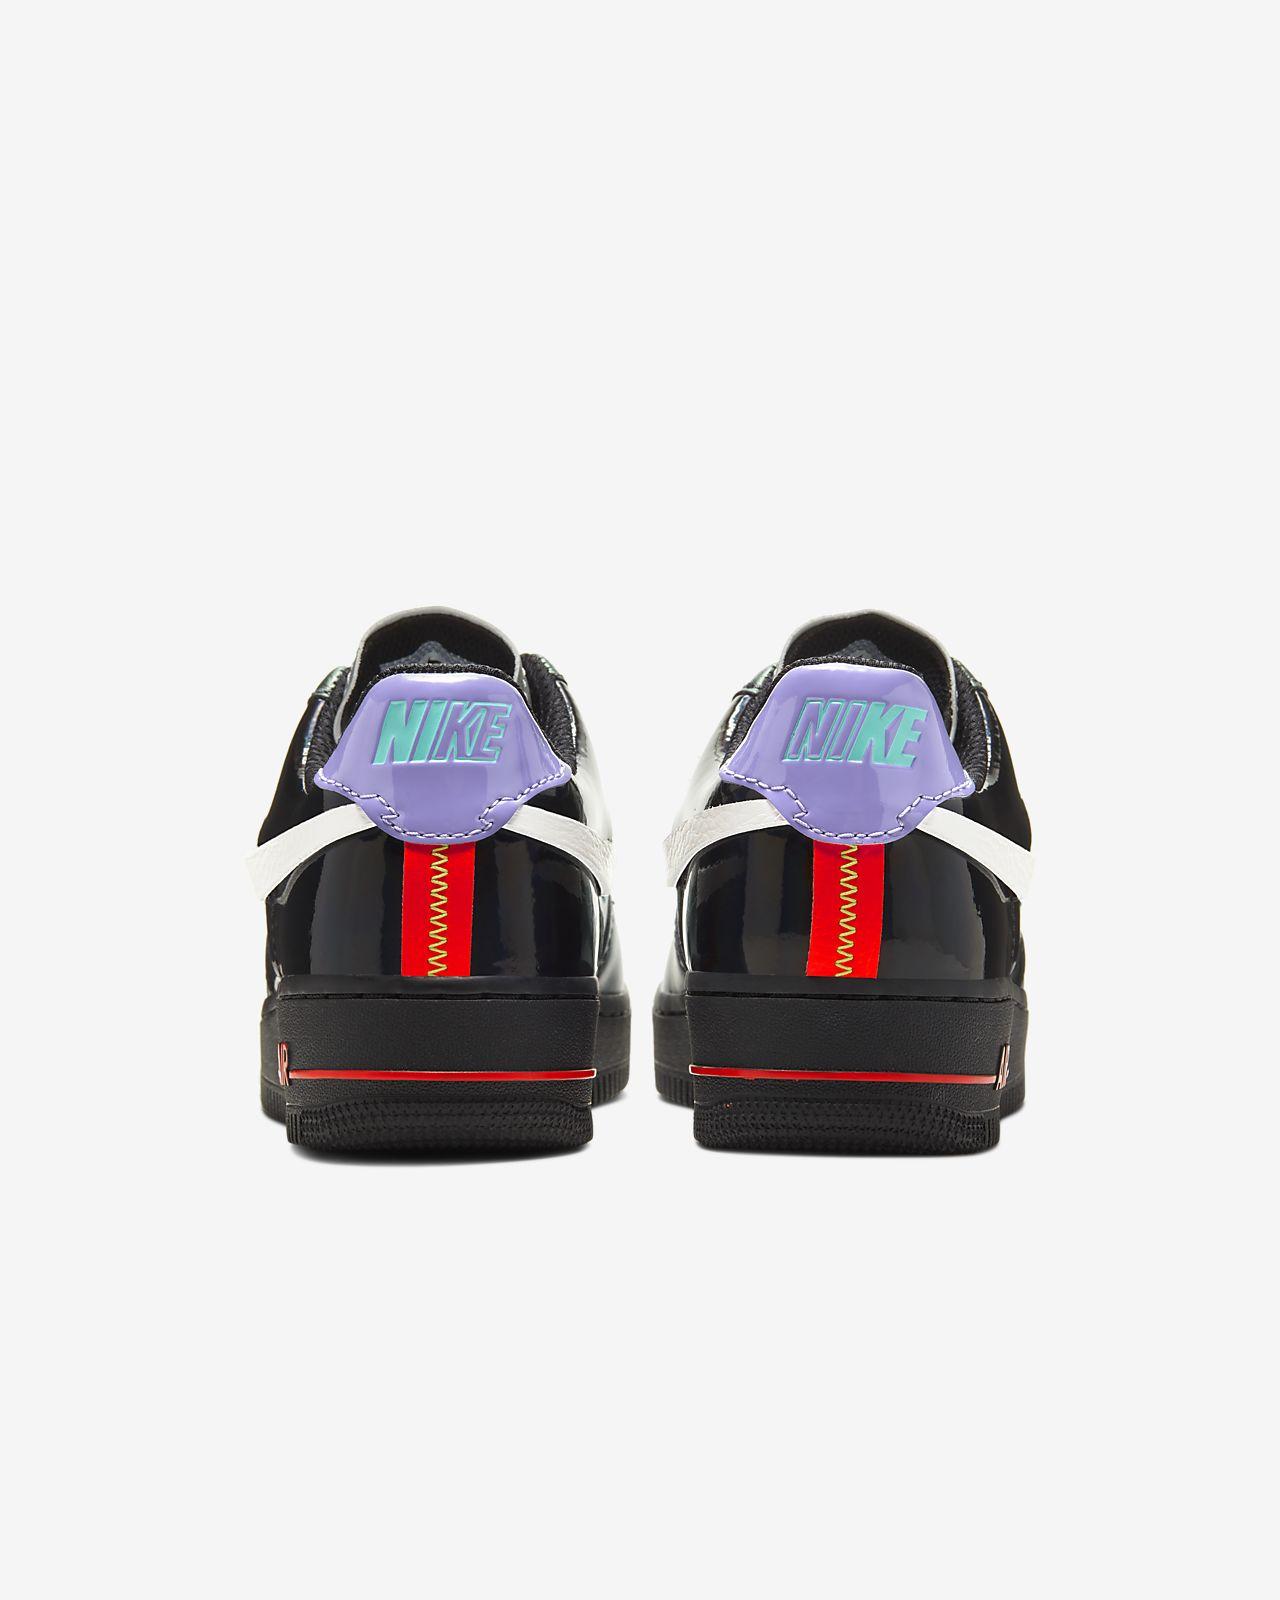 Force Nike '07 Shoe 1 LX Air Women's JcuKF13Tl